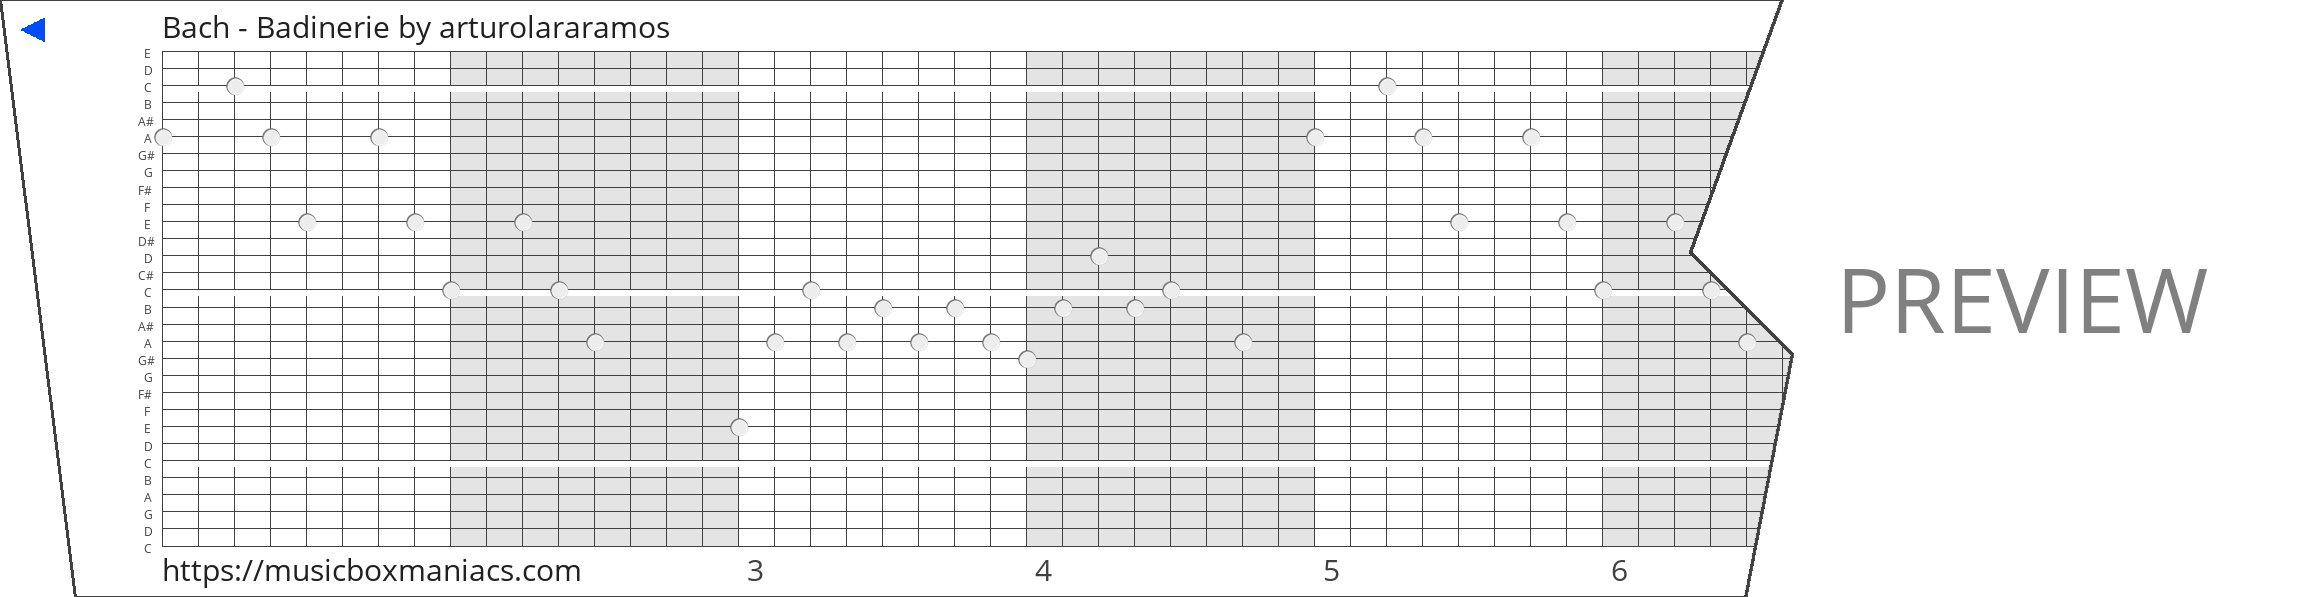 Bach - Badinerie 30 note music box paper strip